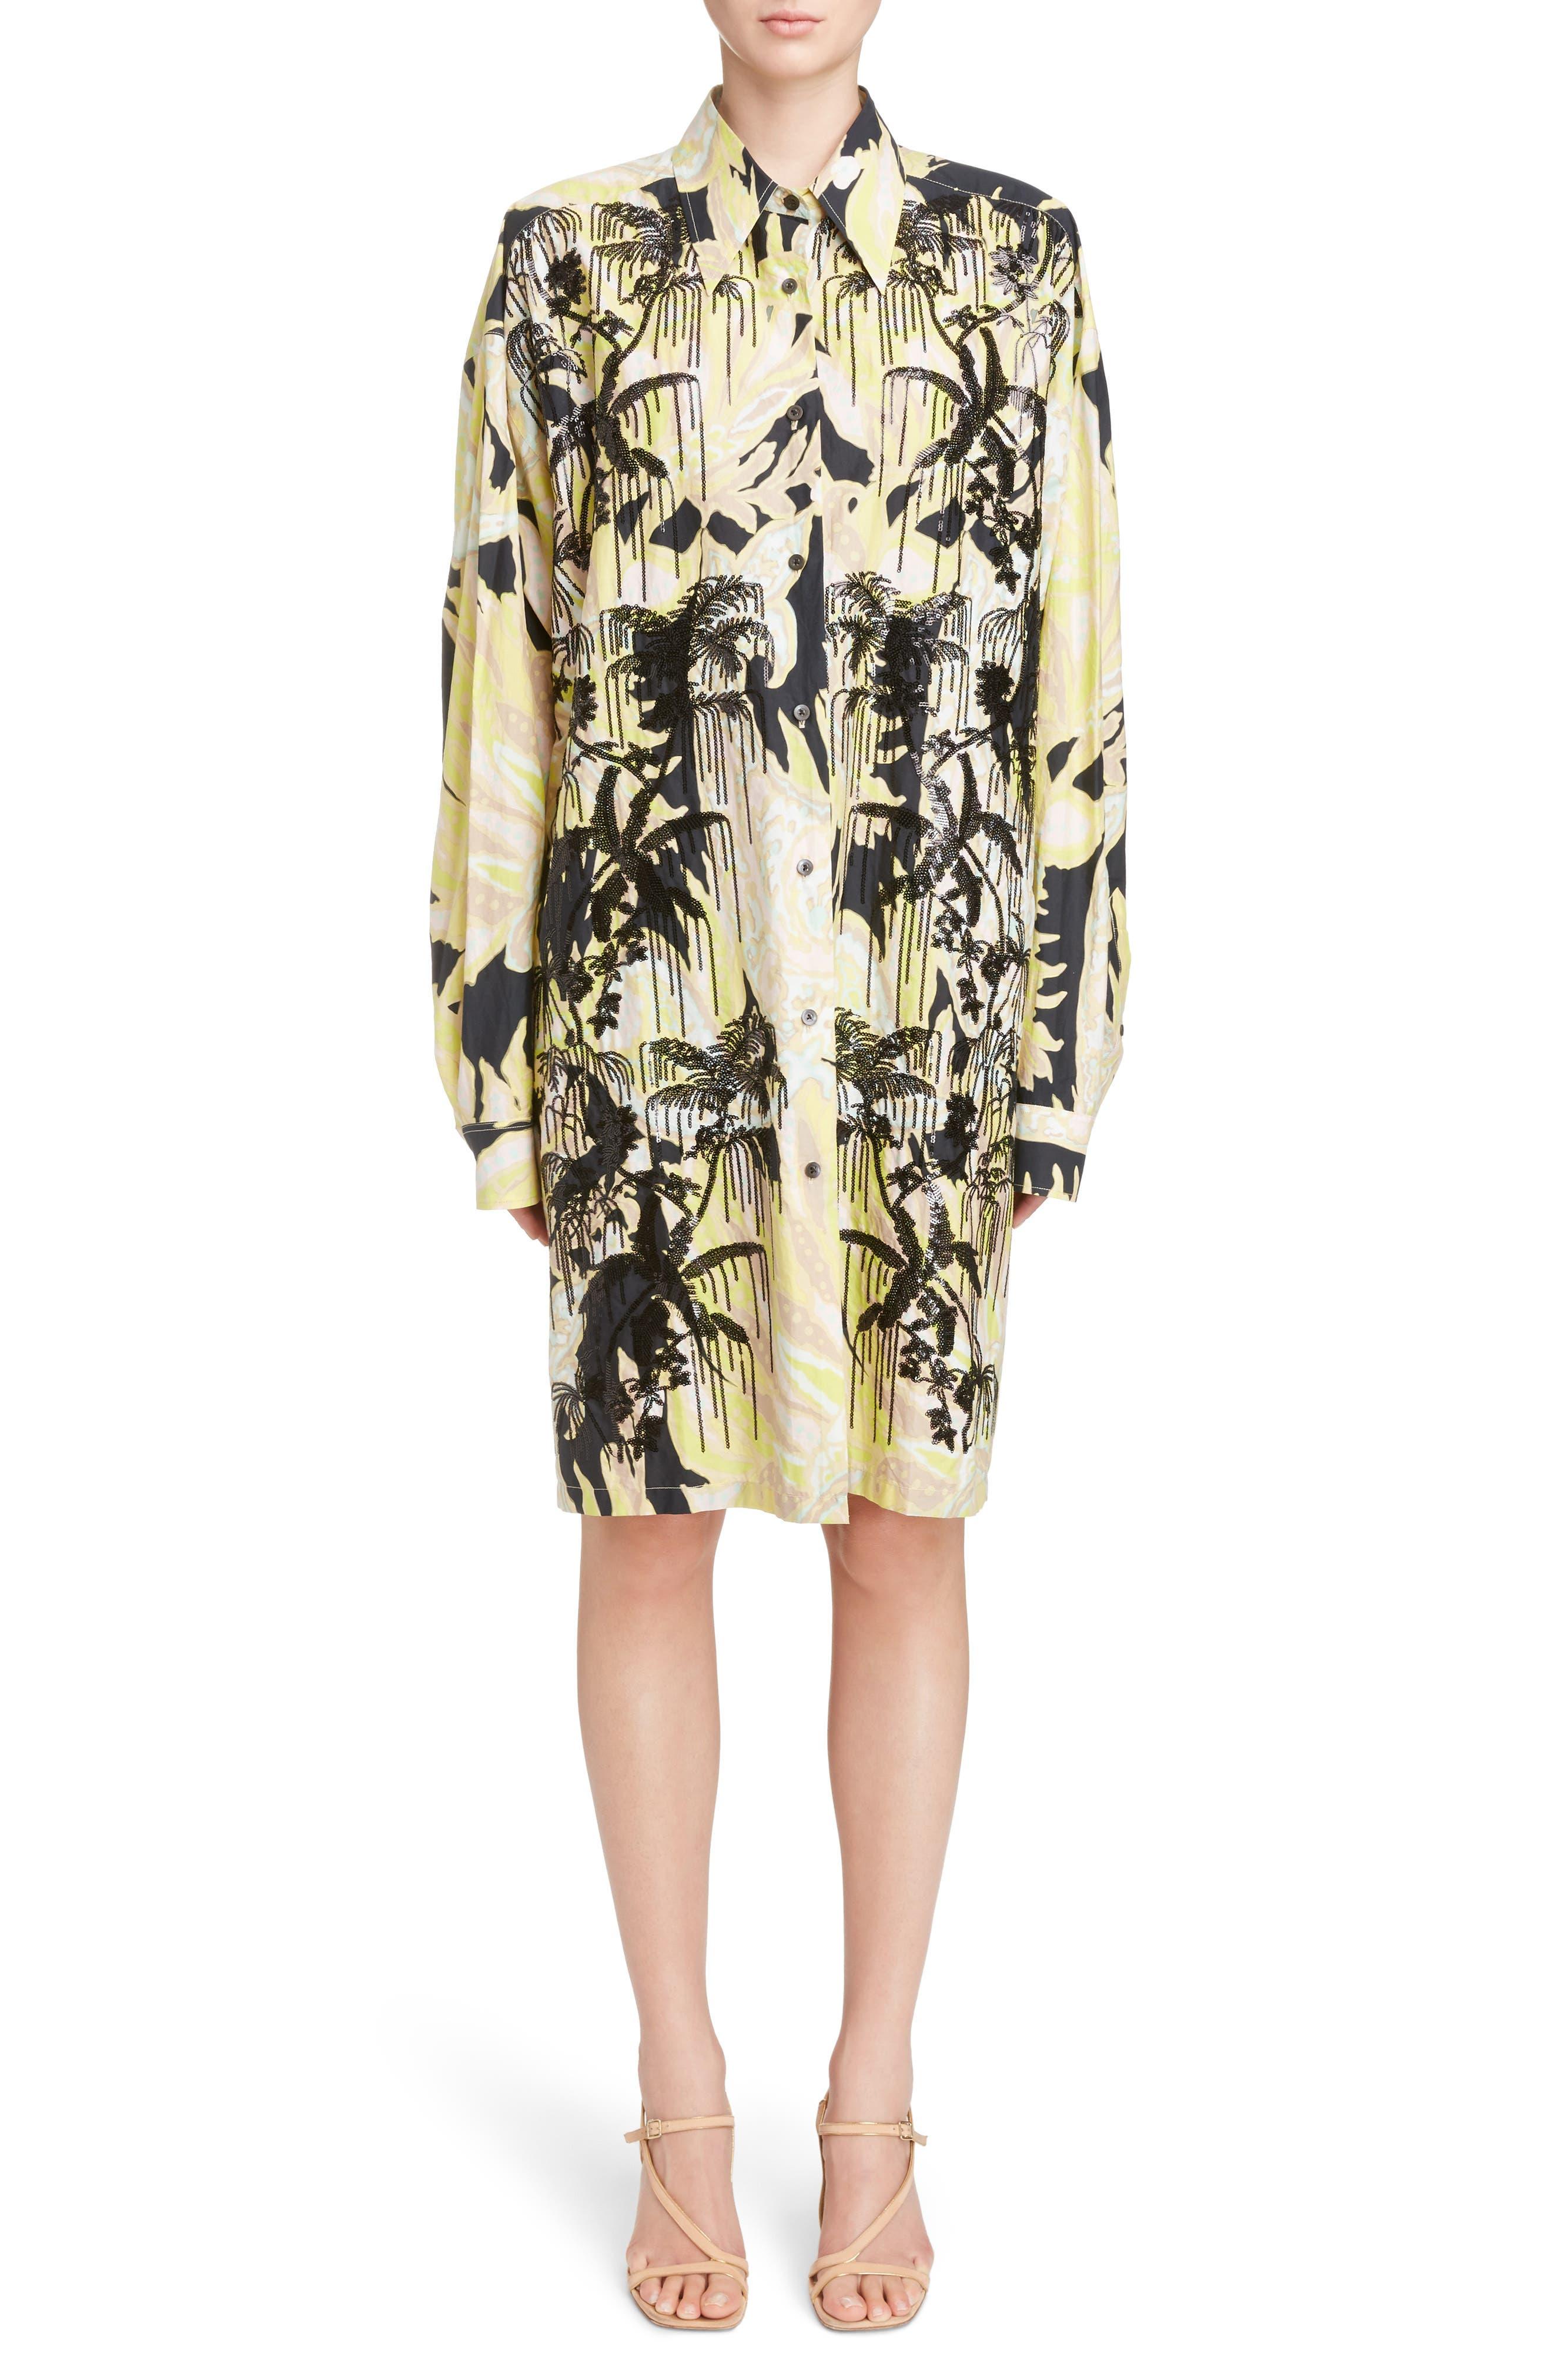 Main Image - Dries Van Noten Sequin Embroidered Palm Print Shirtdress